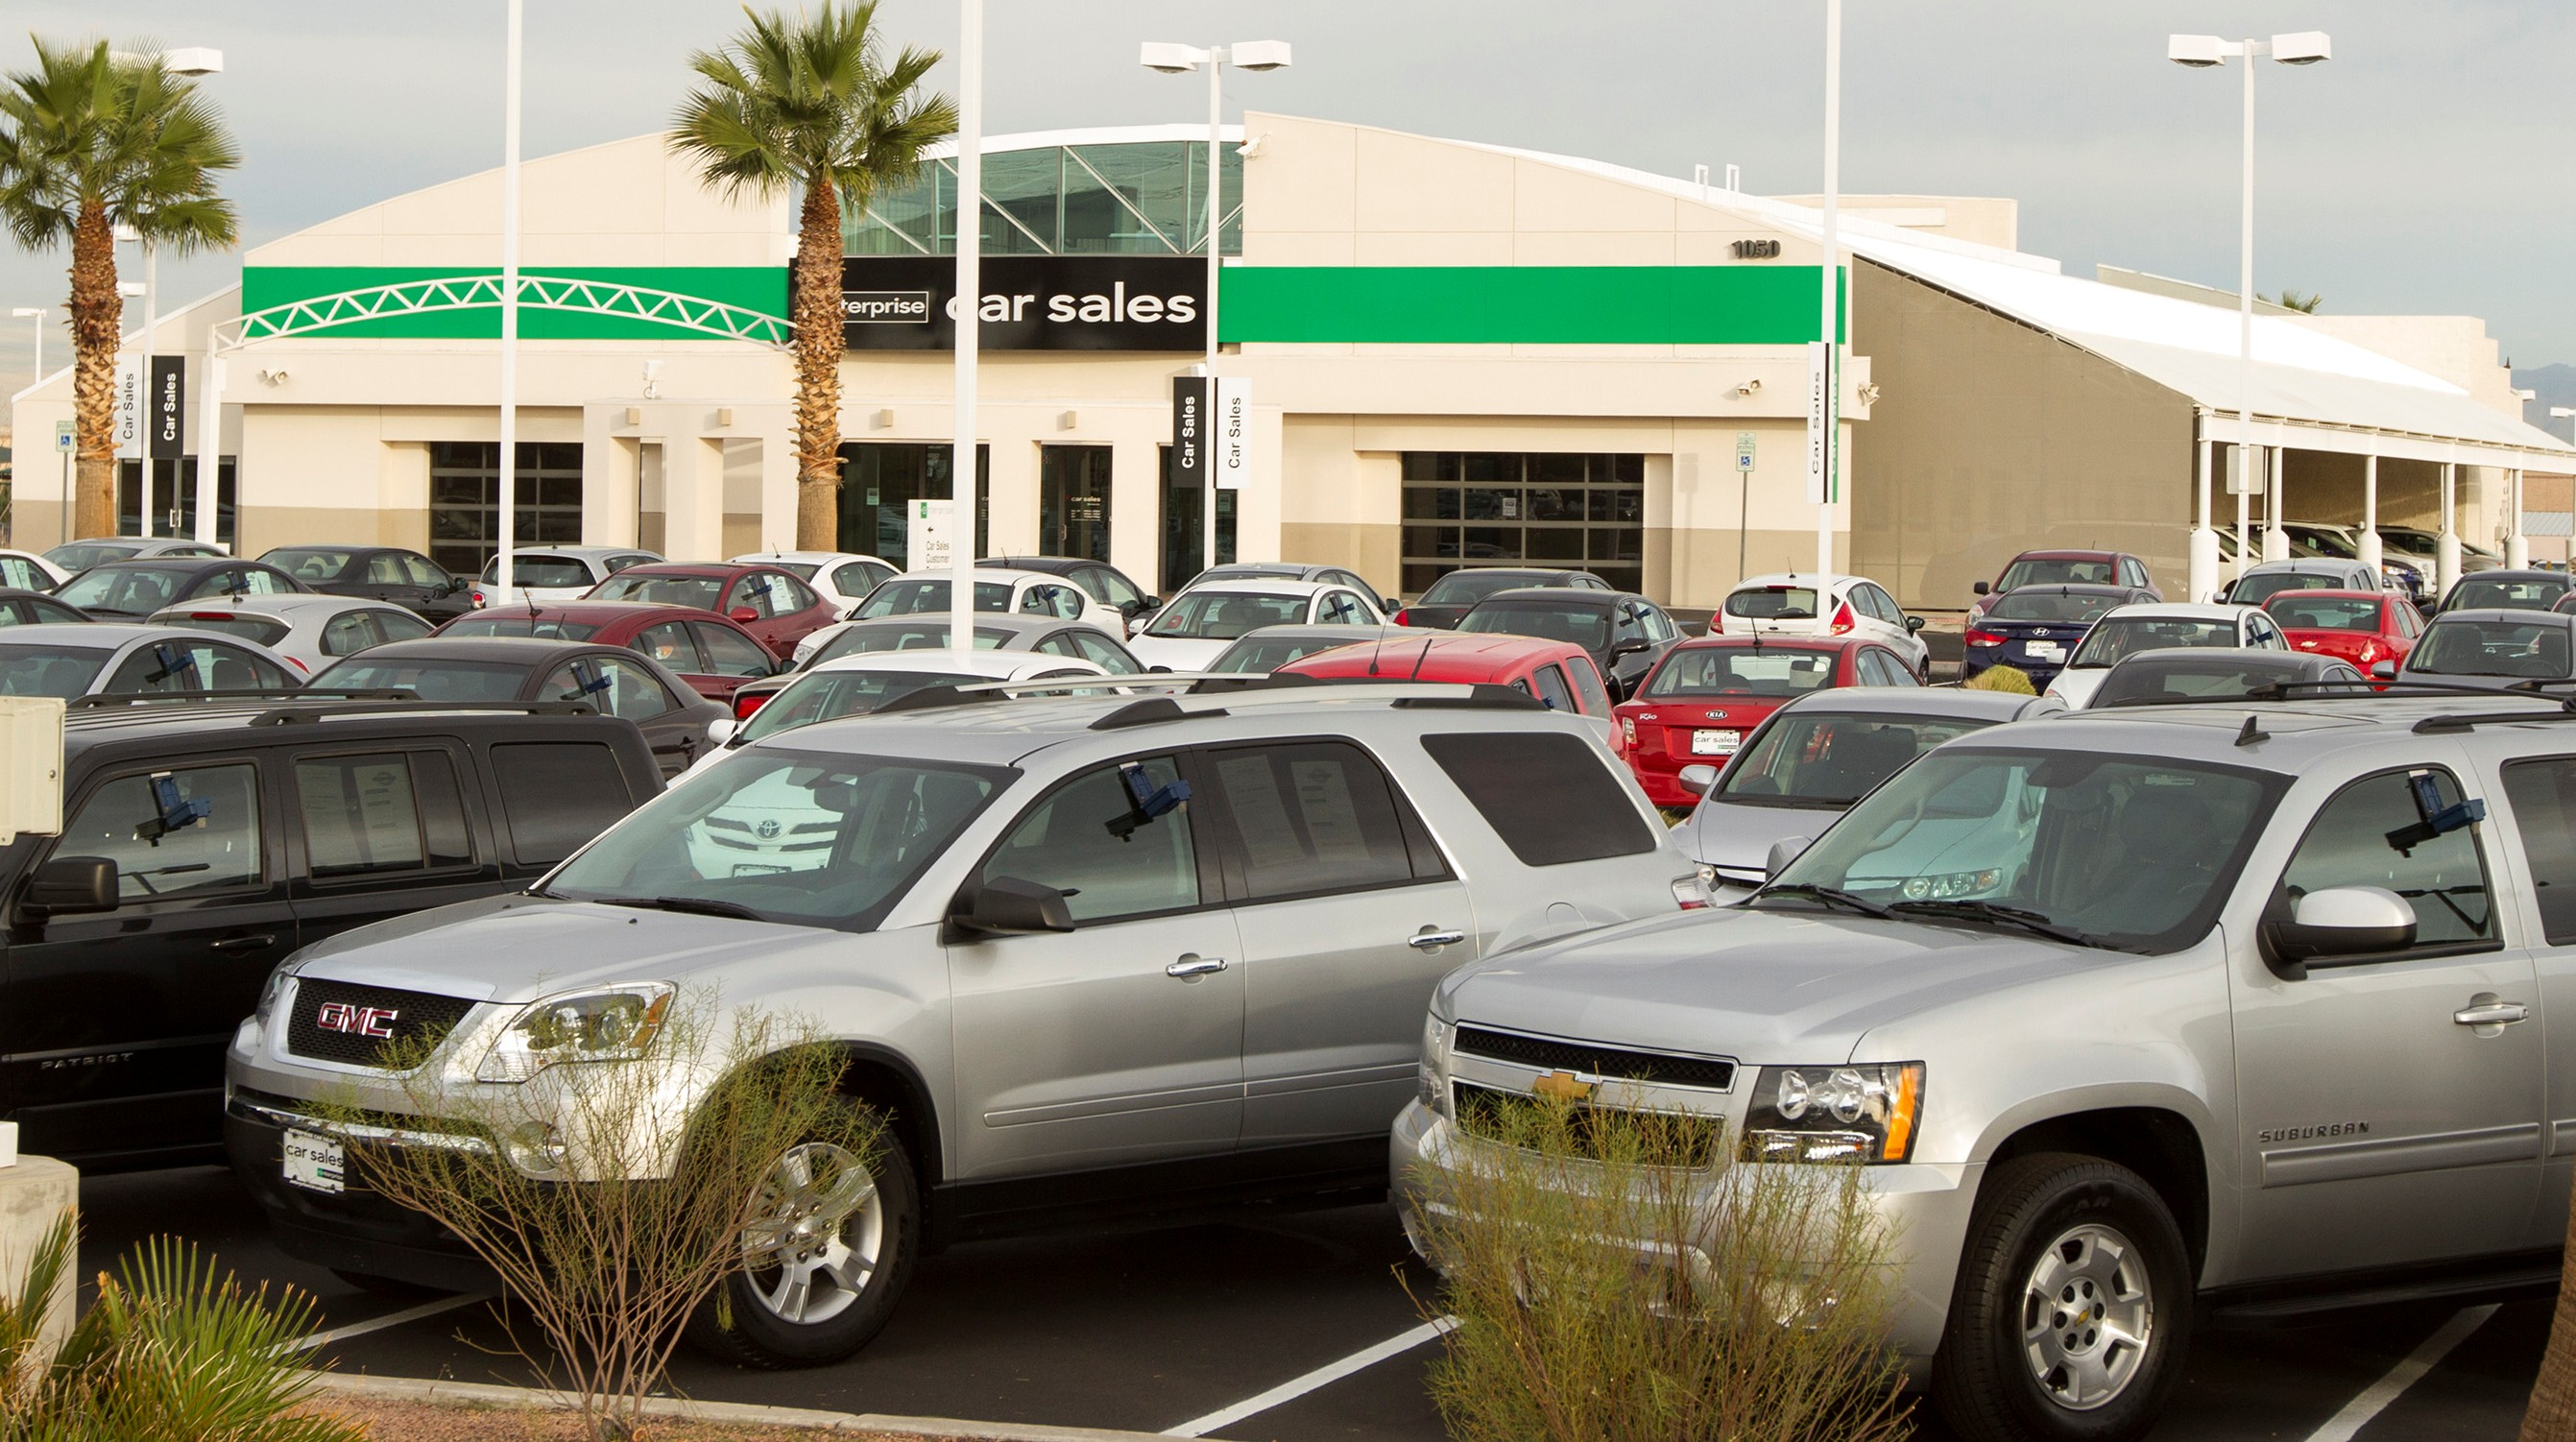 Enterprise Car Sales\' Largest Used Car Showroom In U.S. Opens at ...